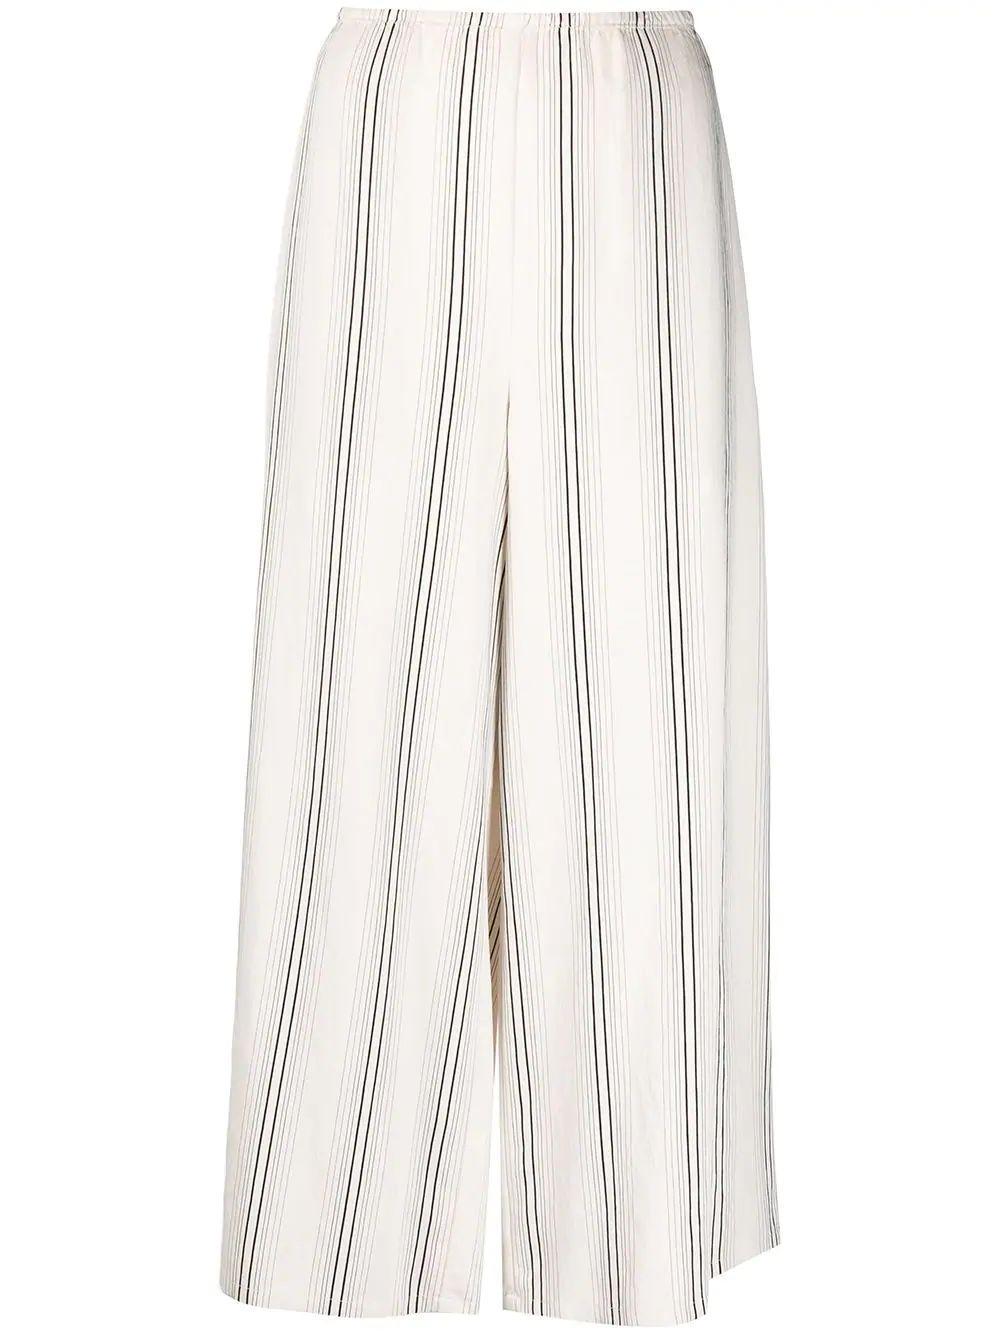 Drapey Stripe Culotte Item # V726621933